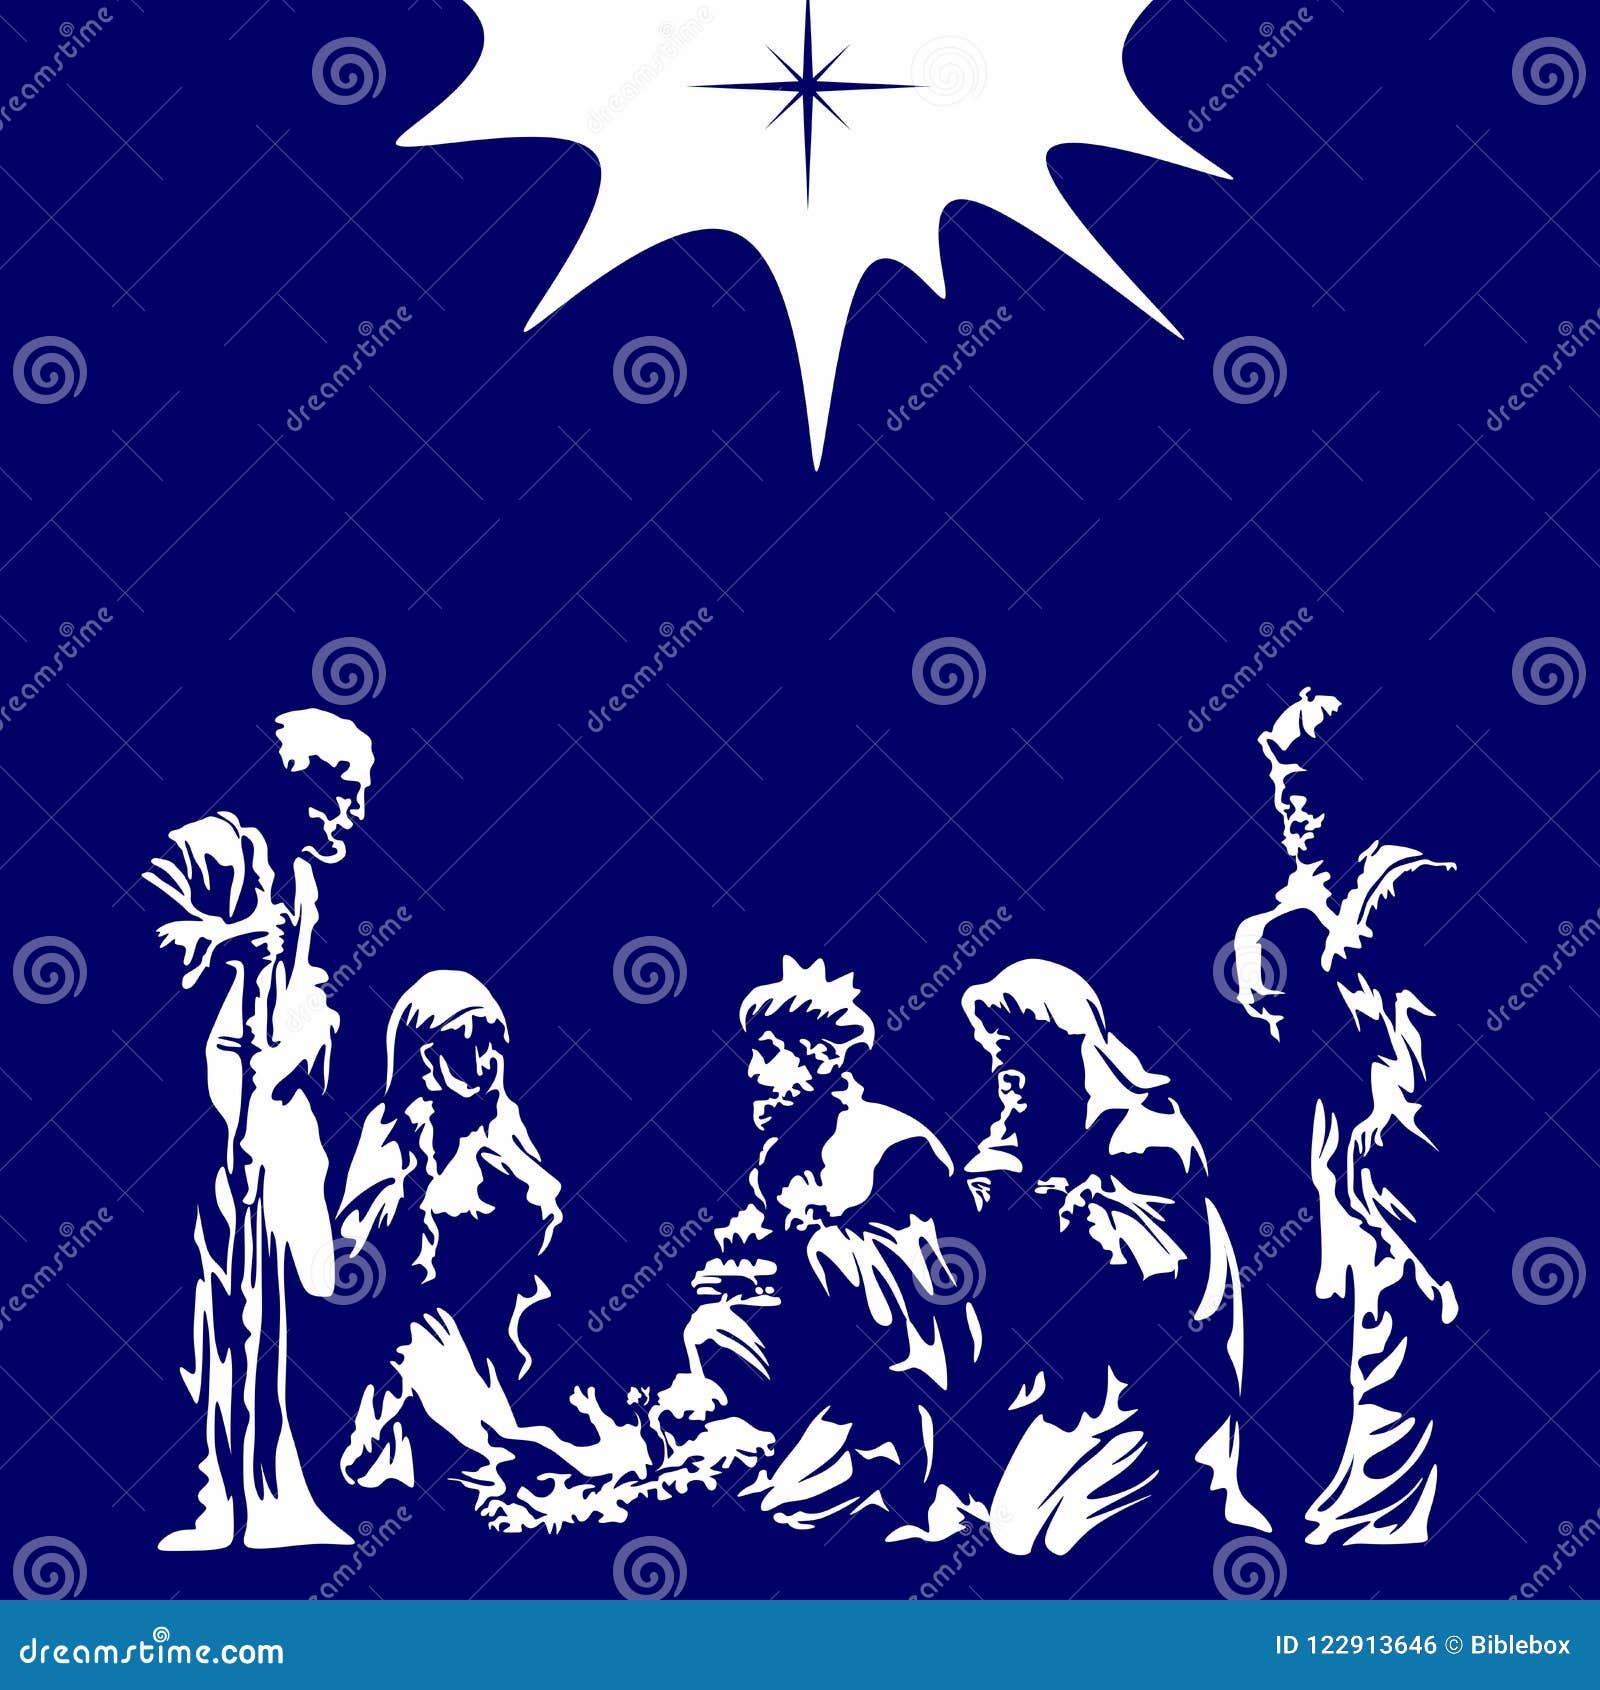 Merry Christmas Christian.Christian Illustration Nativity Scene Merry Christmas